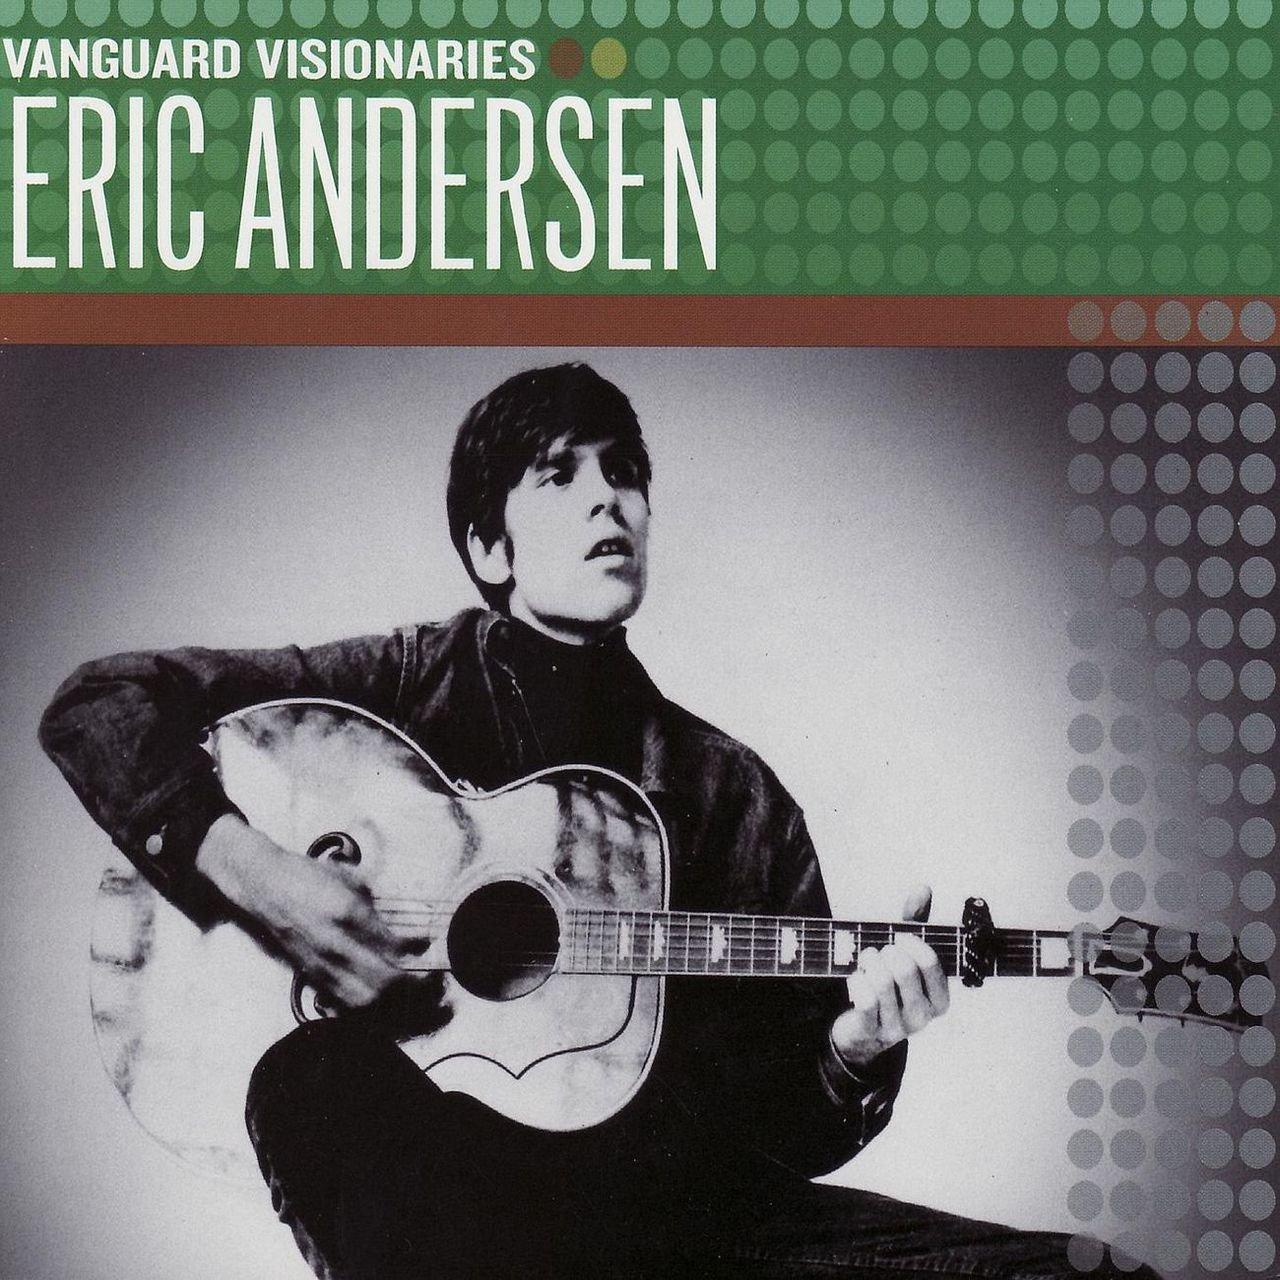 Eric Andersen - Vanguard Visionaries (2007)